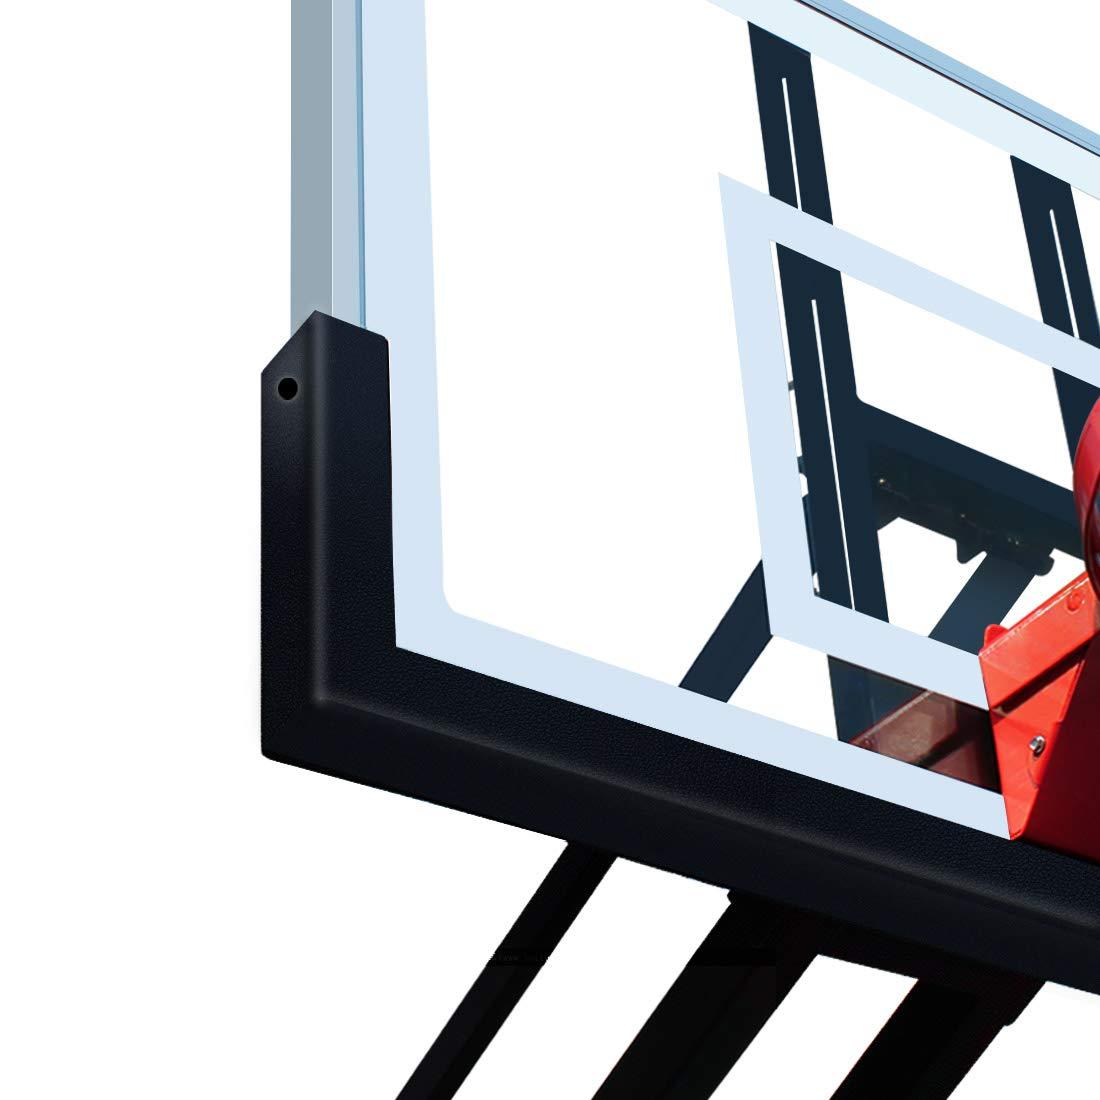 katop ユニバーサル プロスタイル バスケットボール バックボード パディング 72インチ バスケットボールシステムに対応 72\  B07H9QRF6H